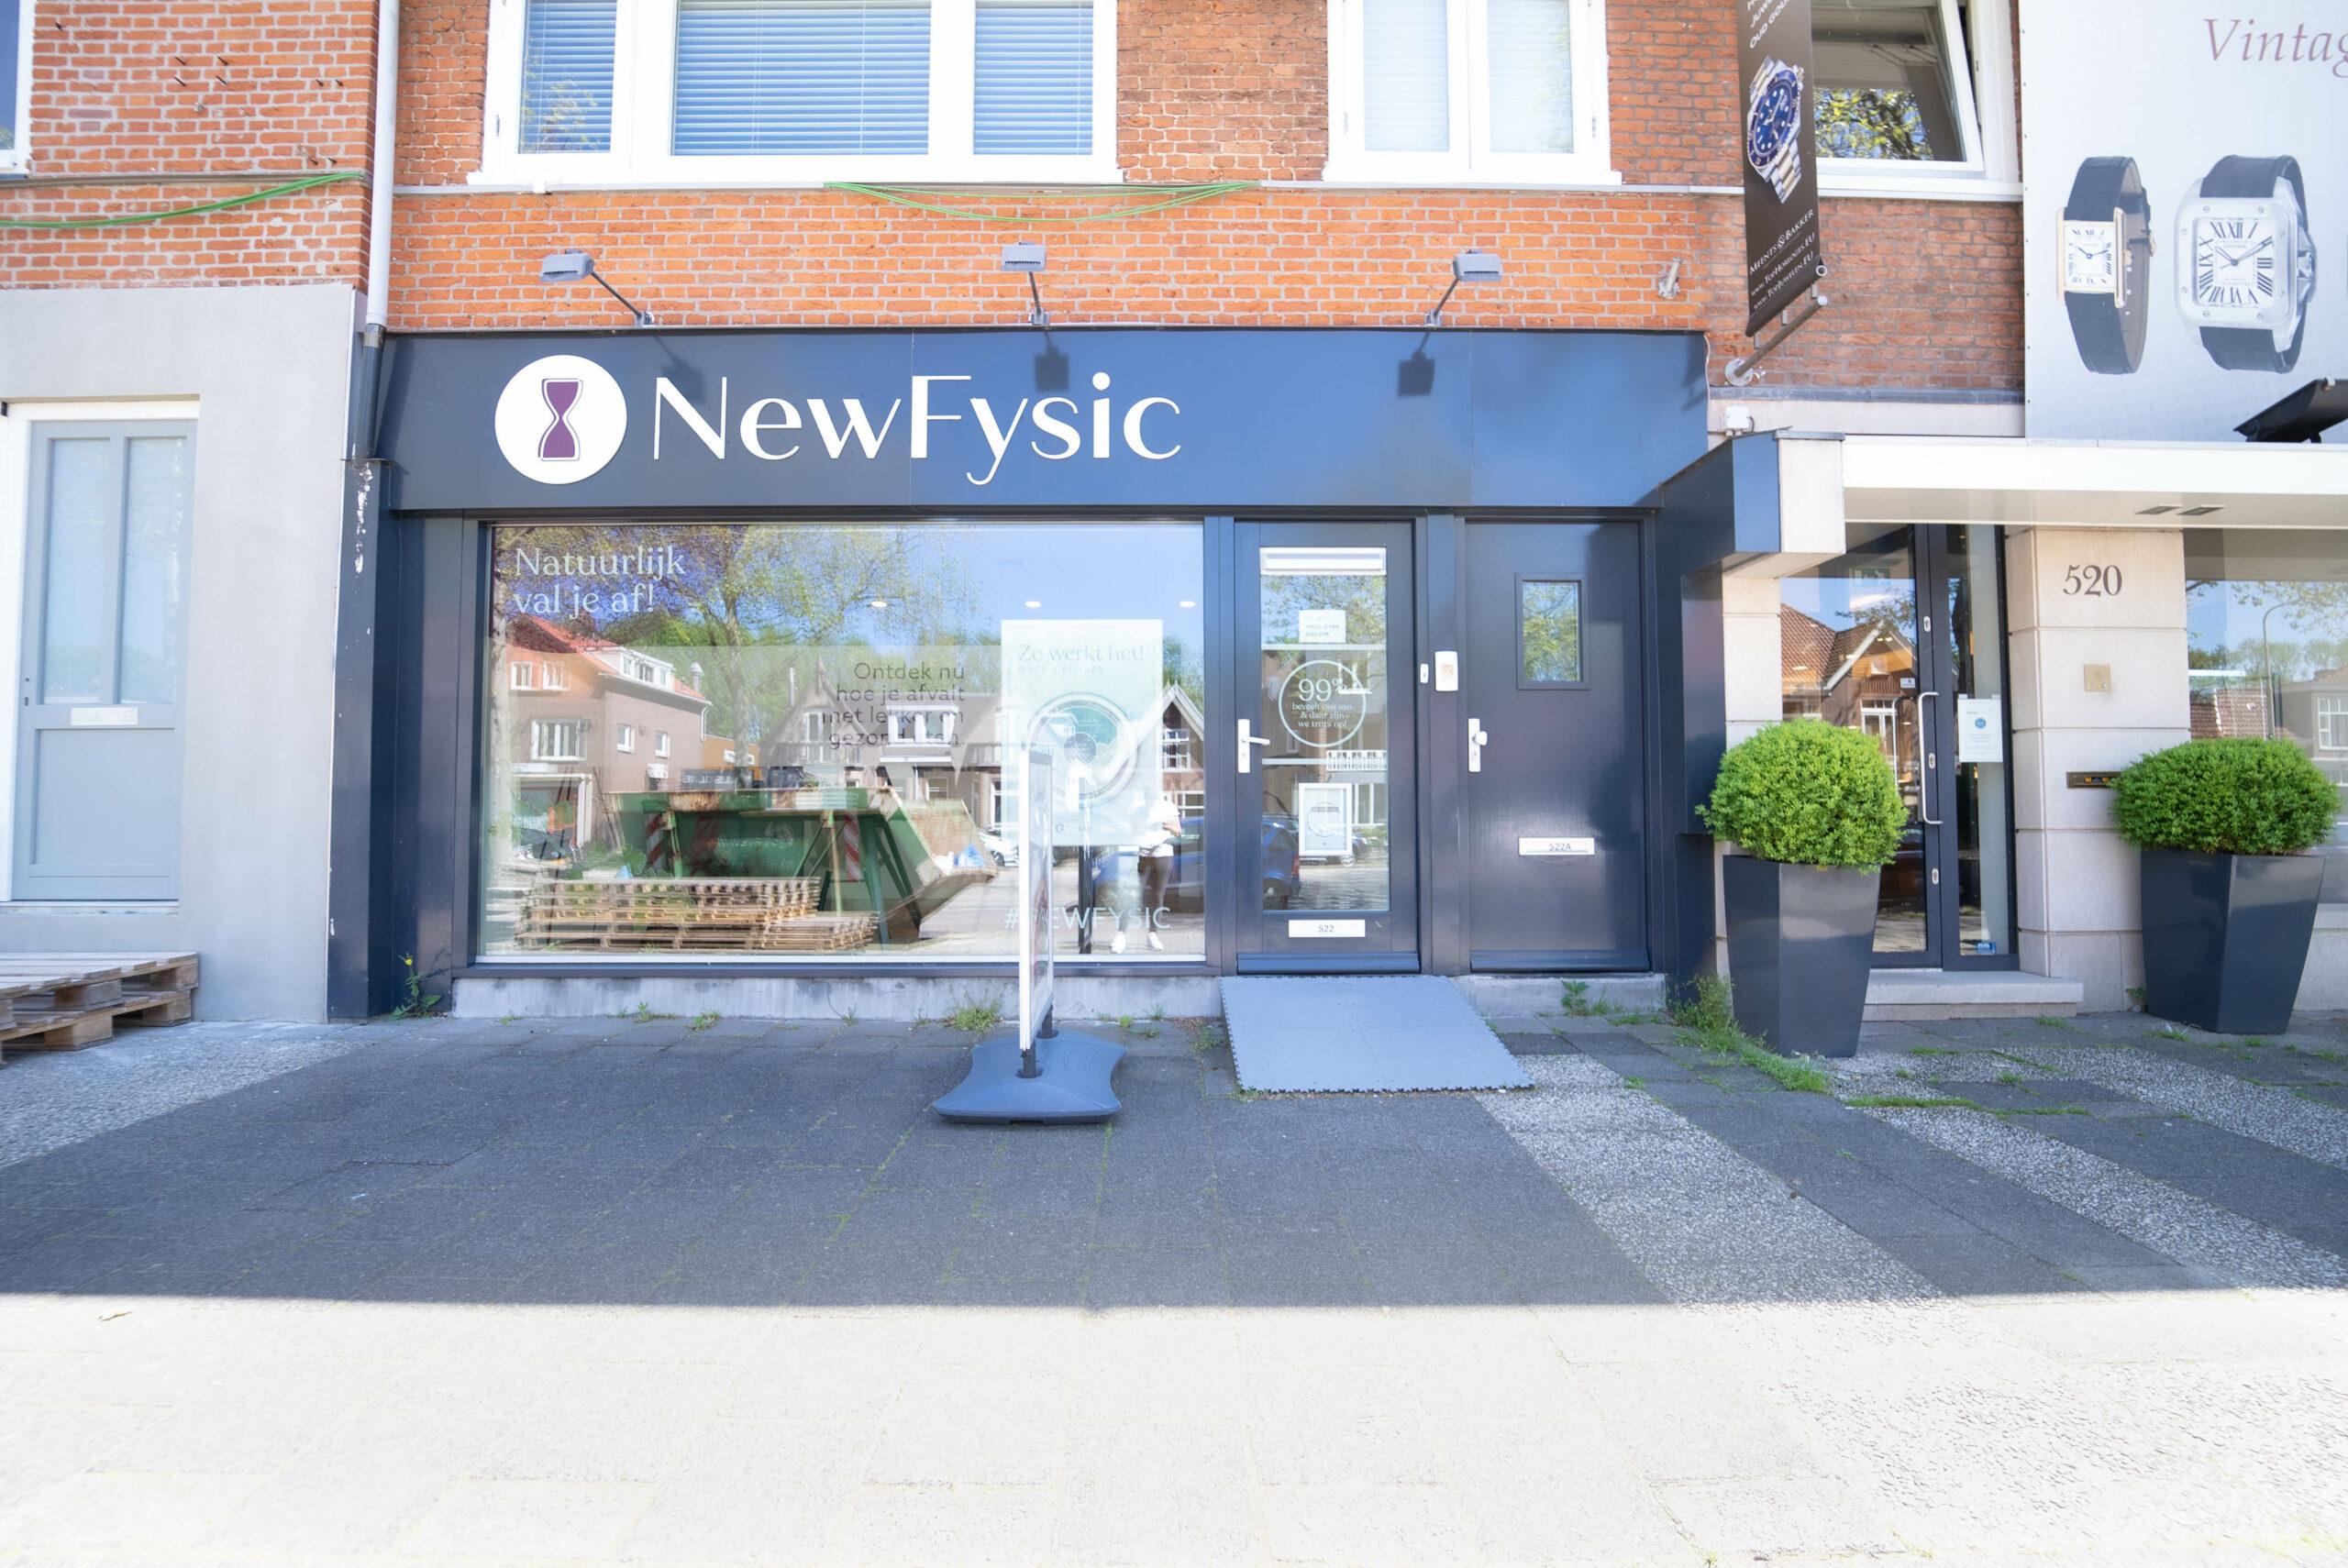 NewFysic Amstelveen